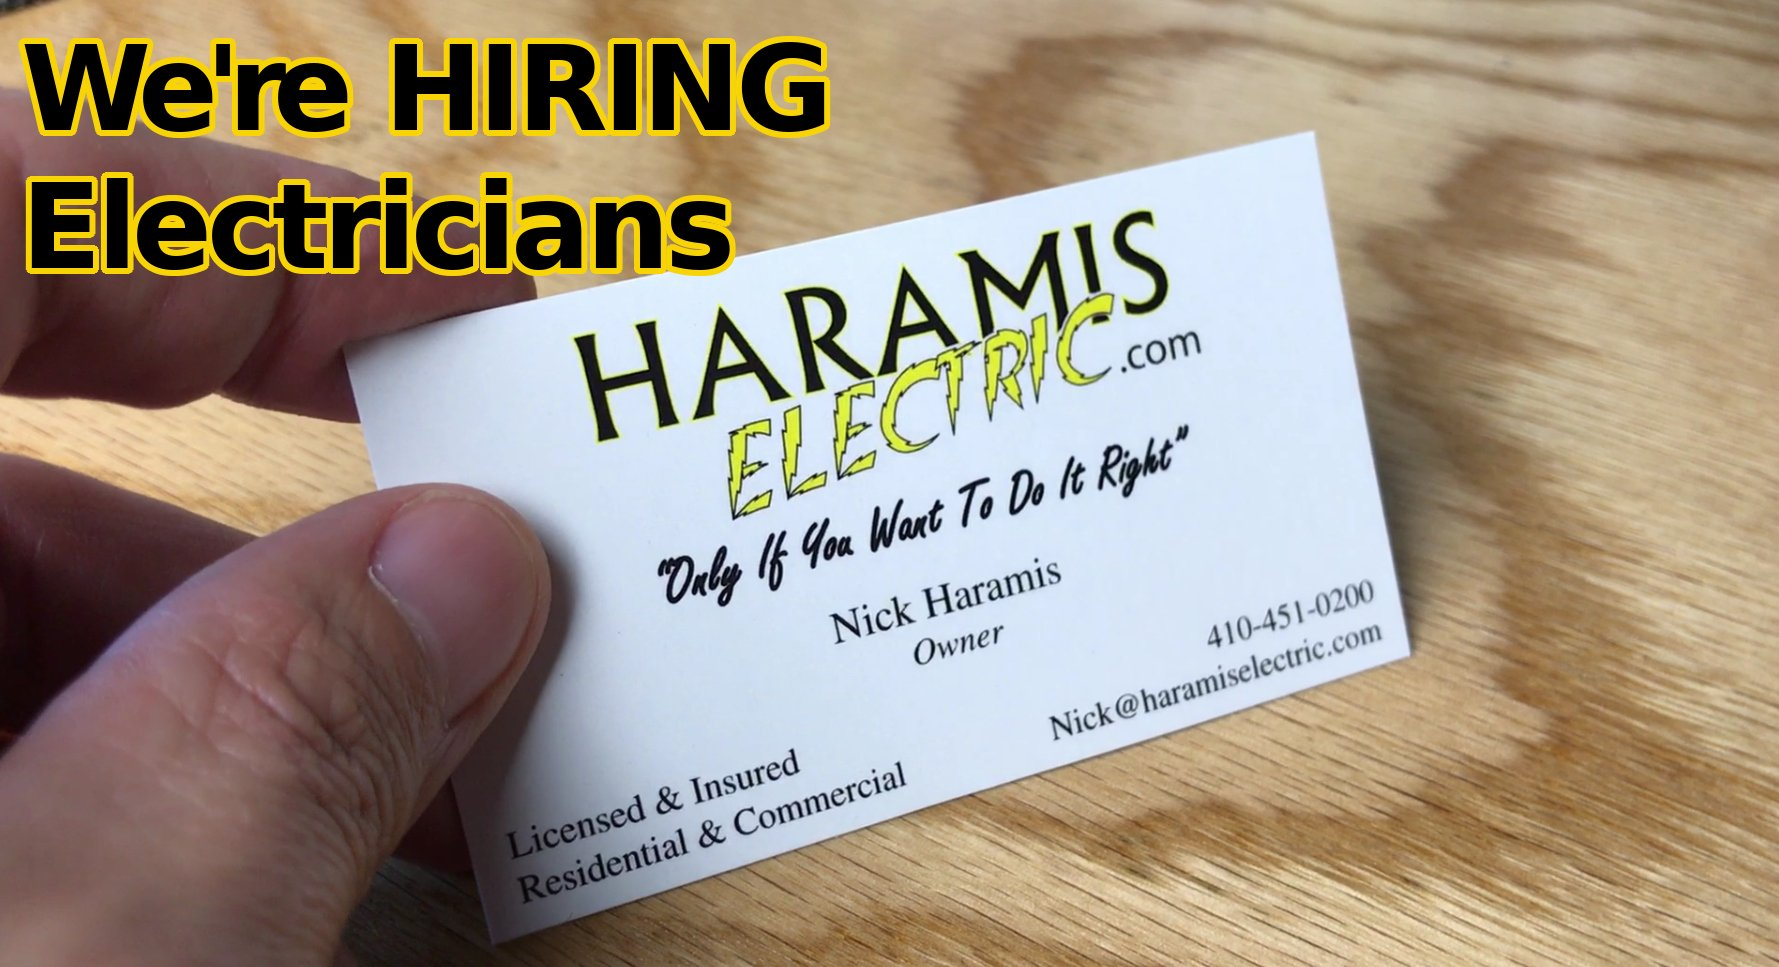 Hiring Severna Park electrician Jobs